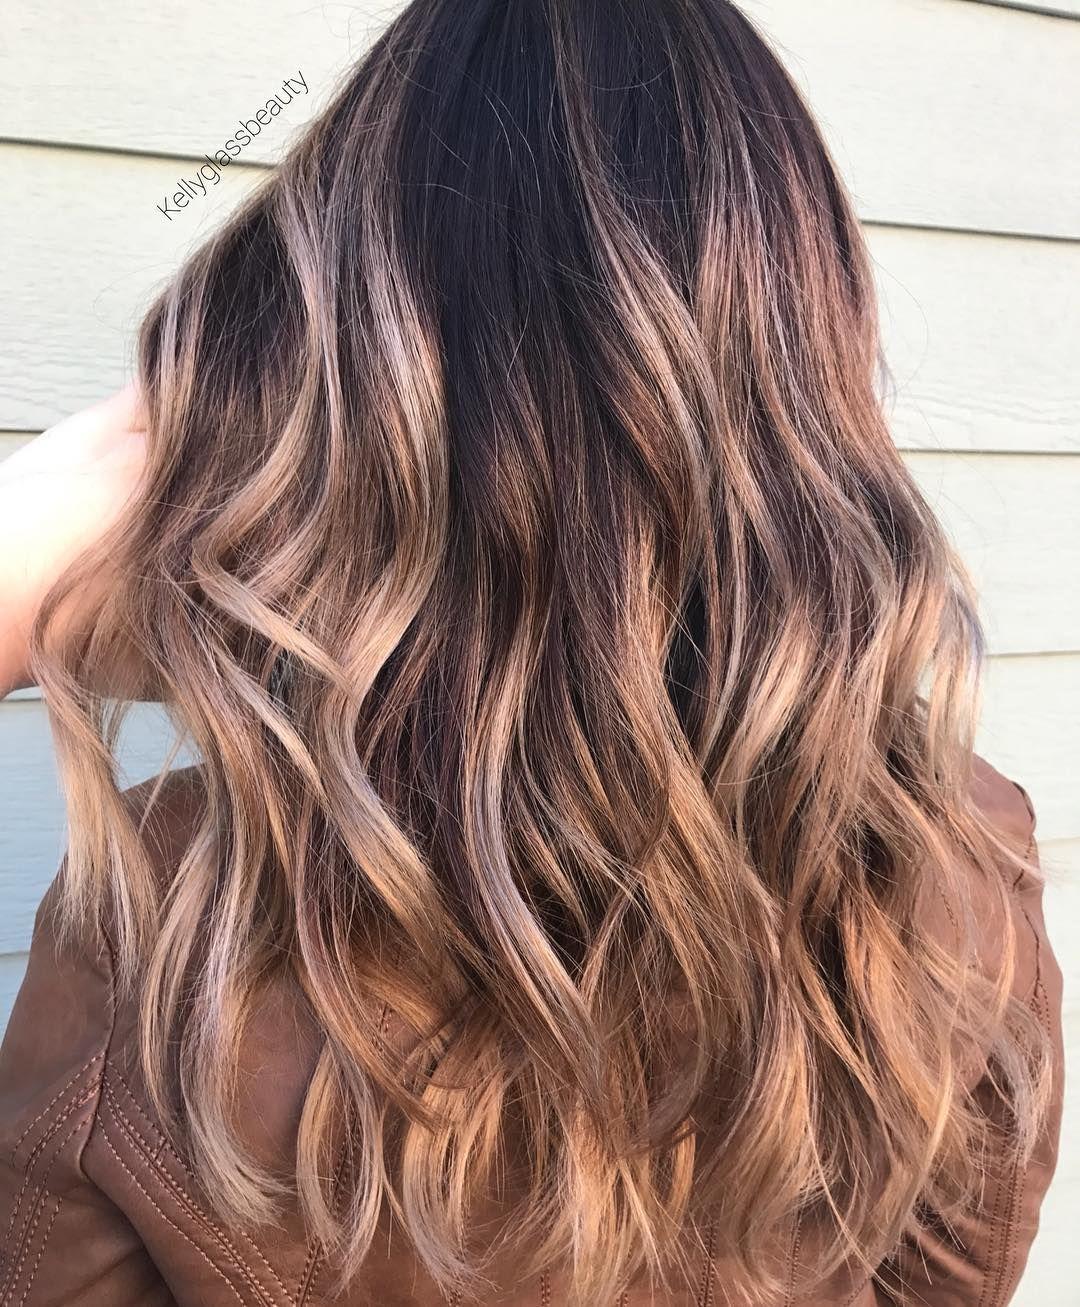 70 Flattering Balayage Hair Color Ideas For 2020 Hair Color Balayage Balayage Hair Balayage Hair Rose